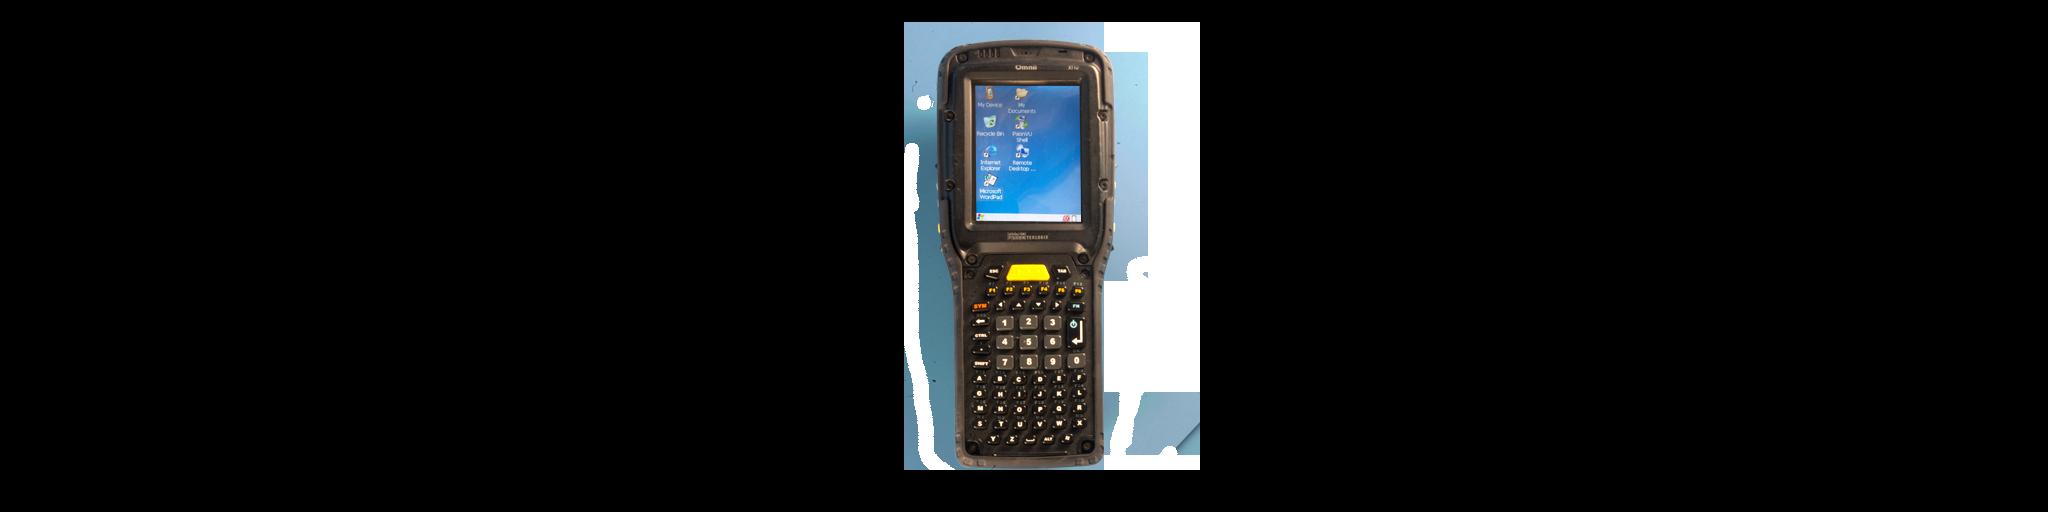 Psion / Teklogix OMNII XT10 RF Handheld Terminal